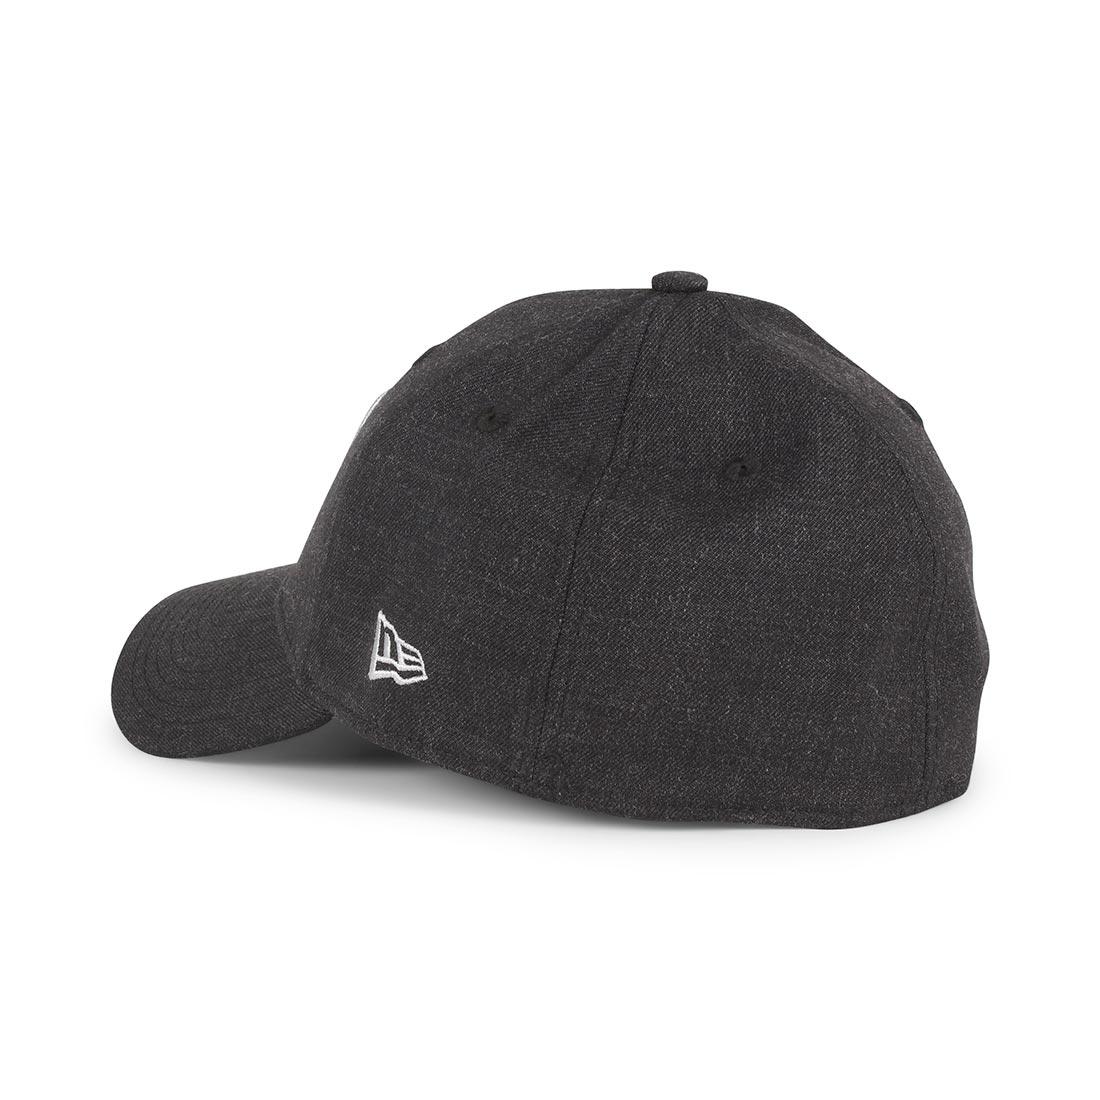 New Era Oakland Raiders Heather Essential 39Thirty Cap - Black / Black